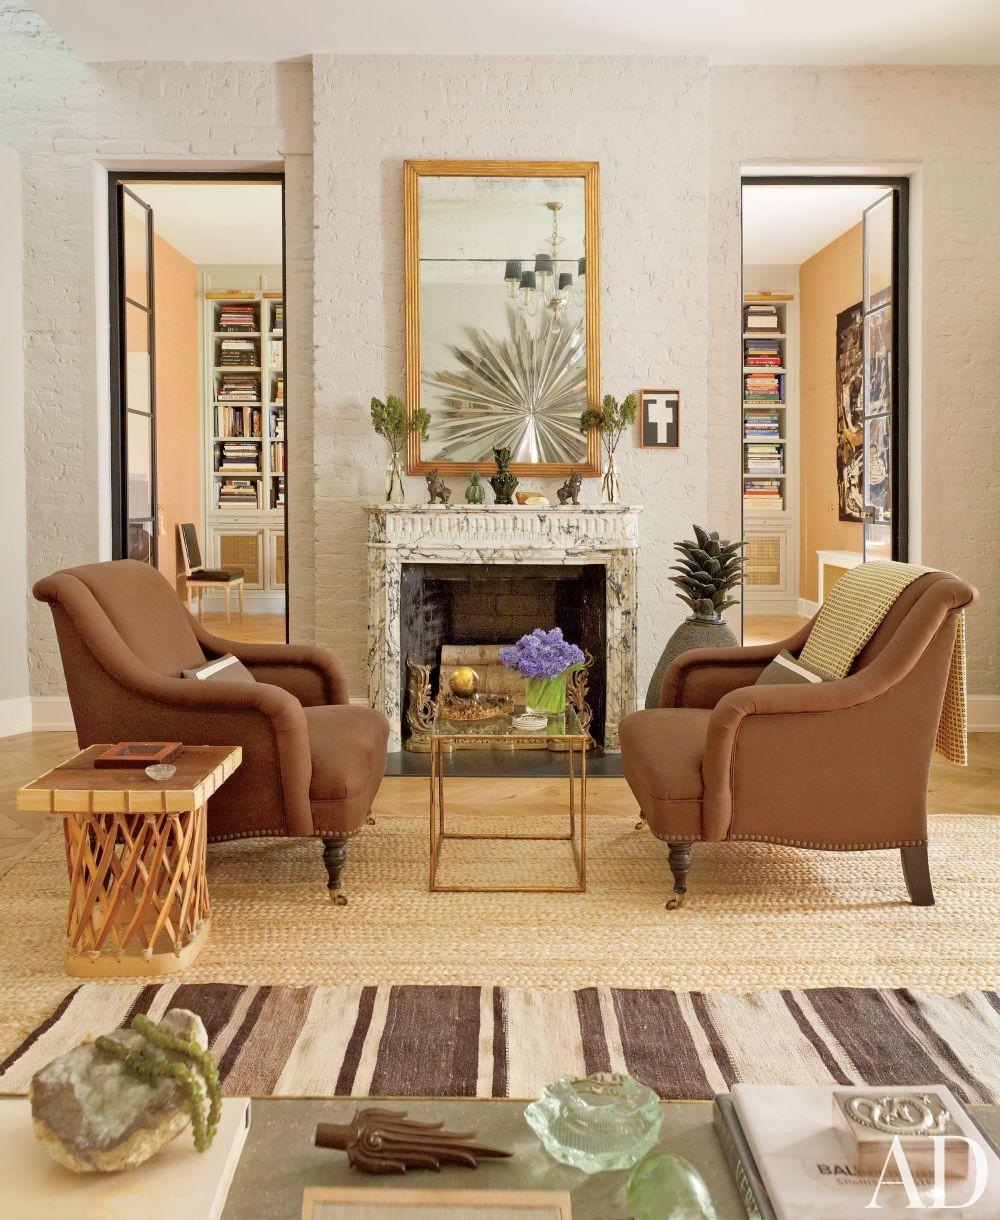 Contemporary Living Room by Nate Berkus in New York, New York